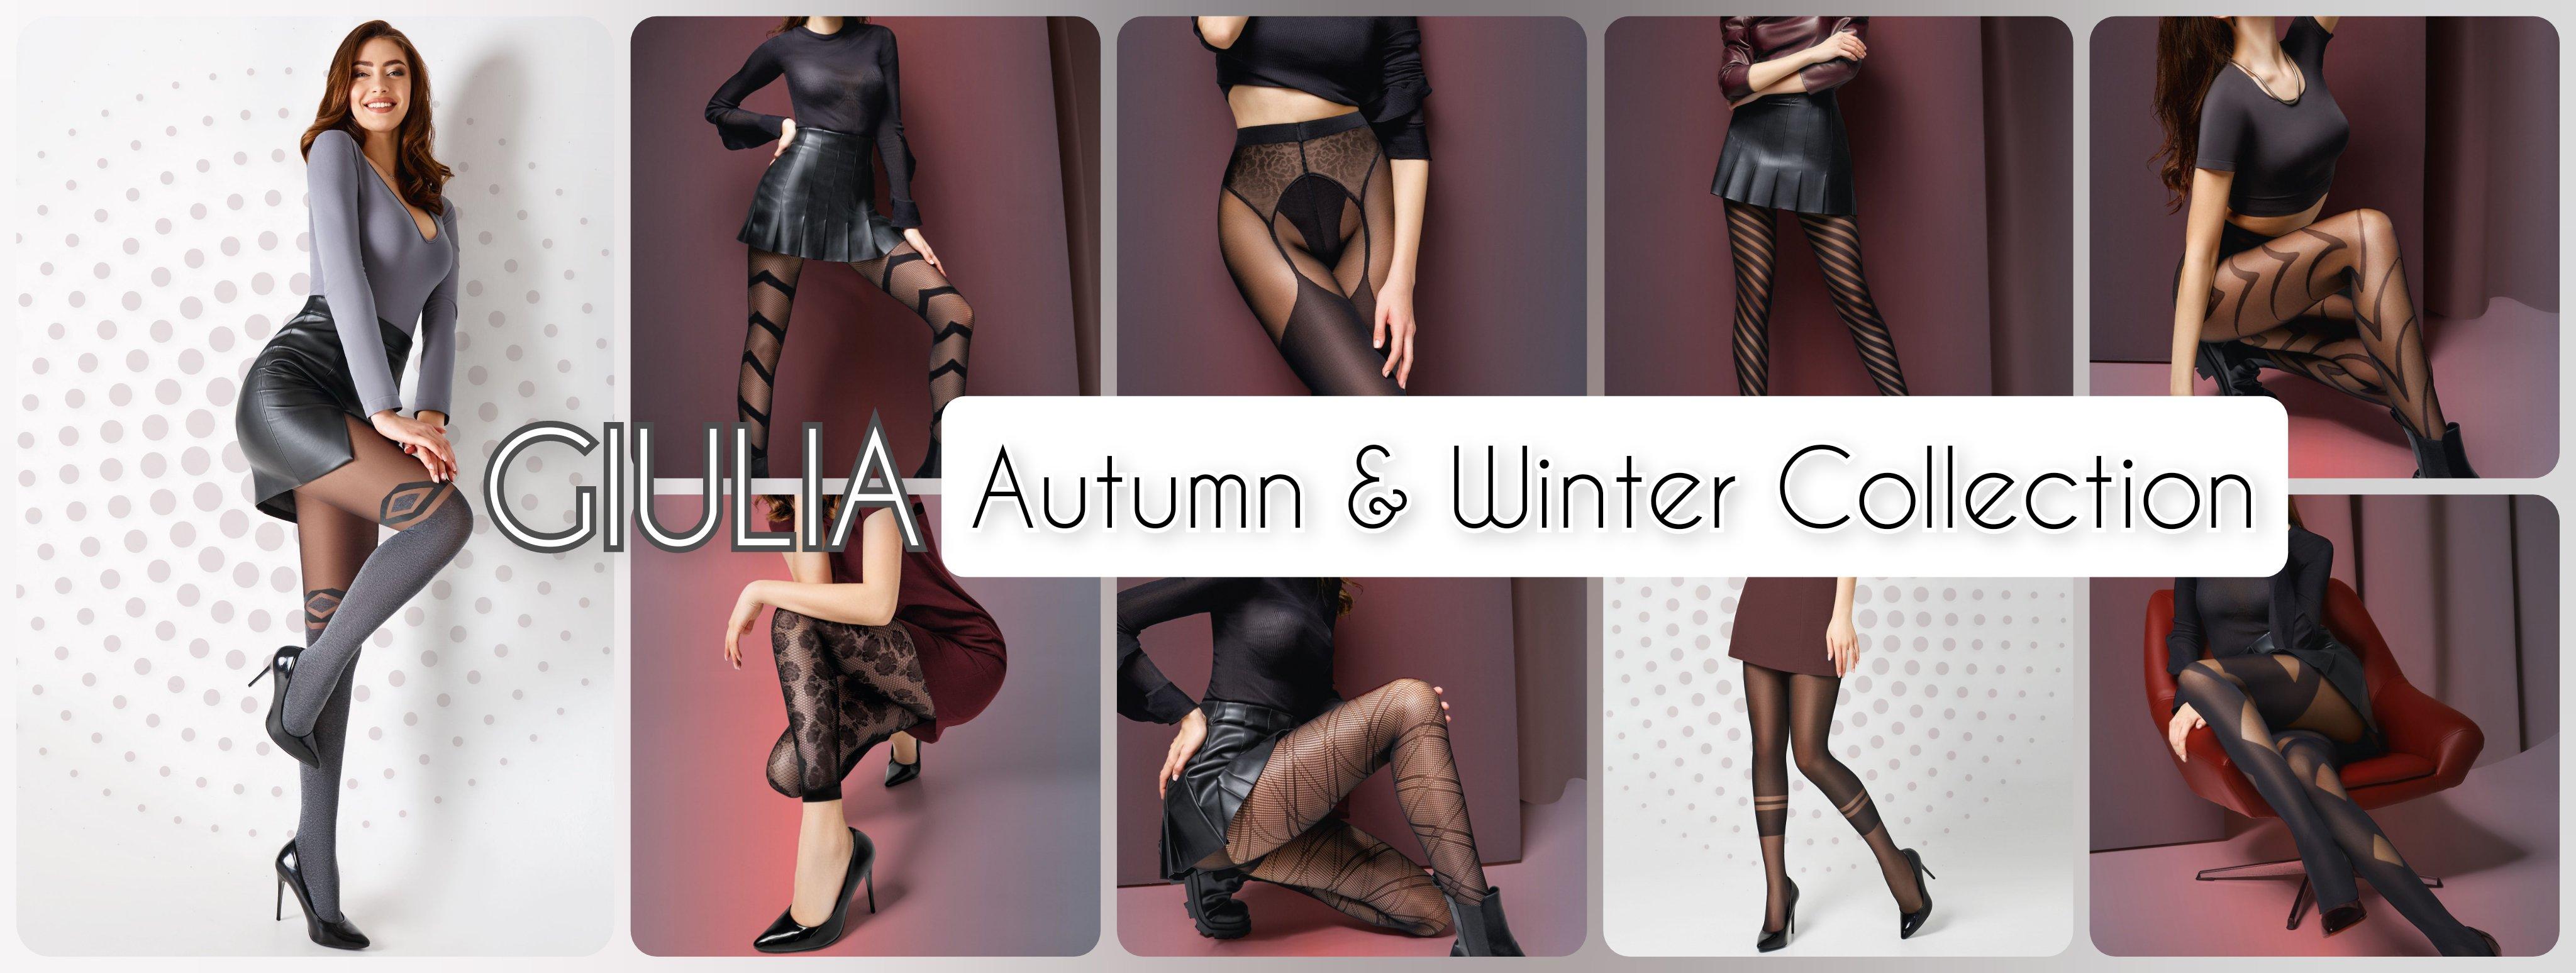 Giulia Fantasy Herbstkollektion 2021 Fashion Strum